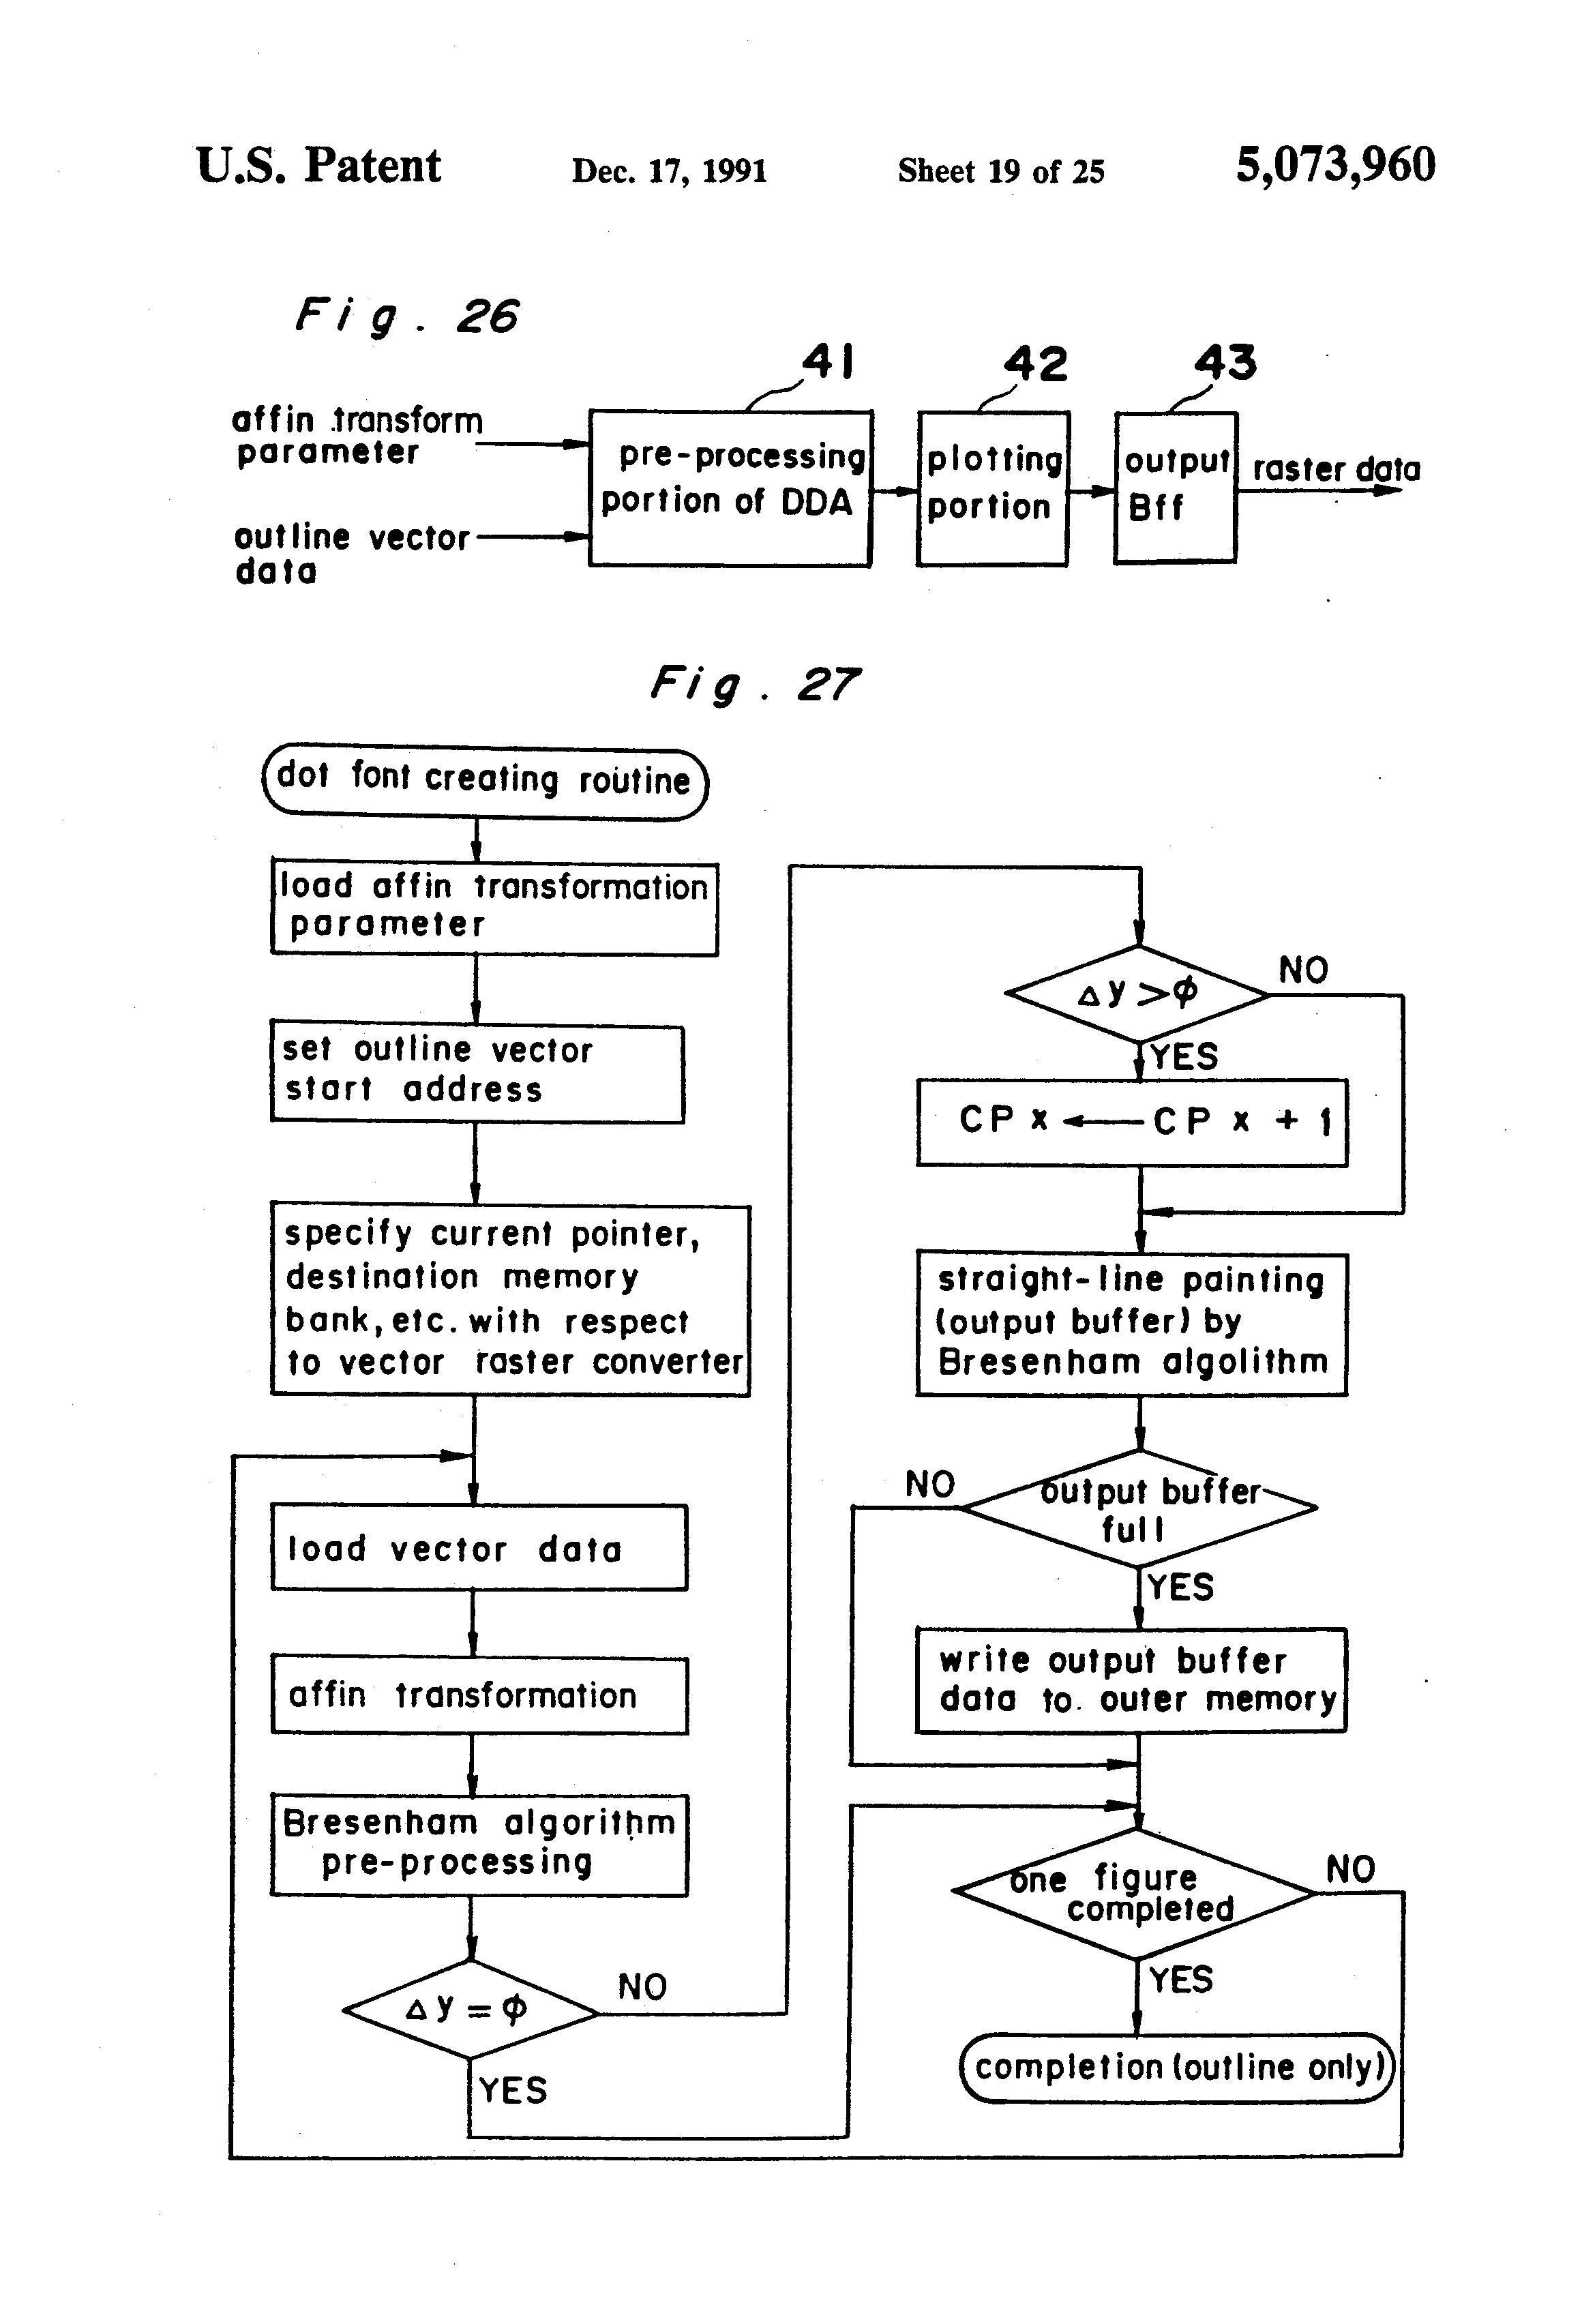 Line Drawing Using Bresenham Algorithm : Patent us image processing method using improved